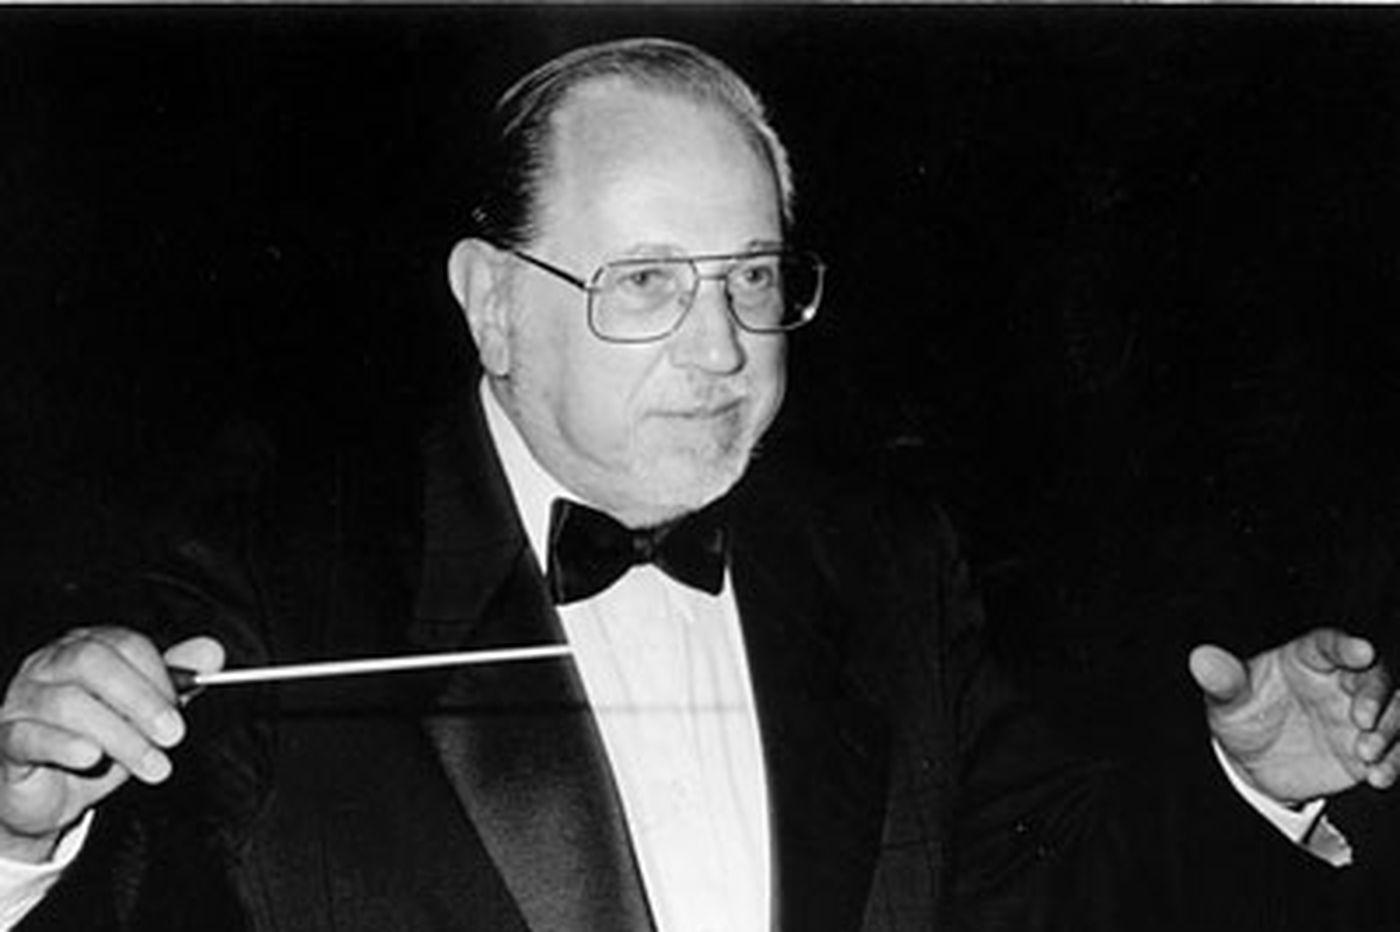 Musician Irving Ludwig dies at 83